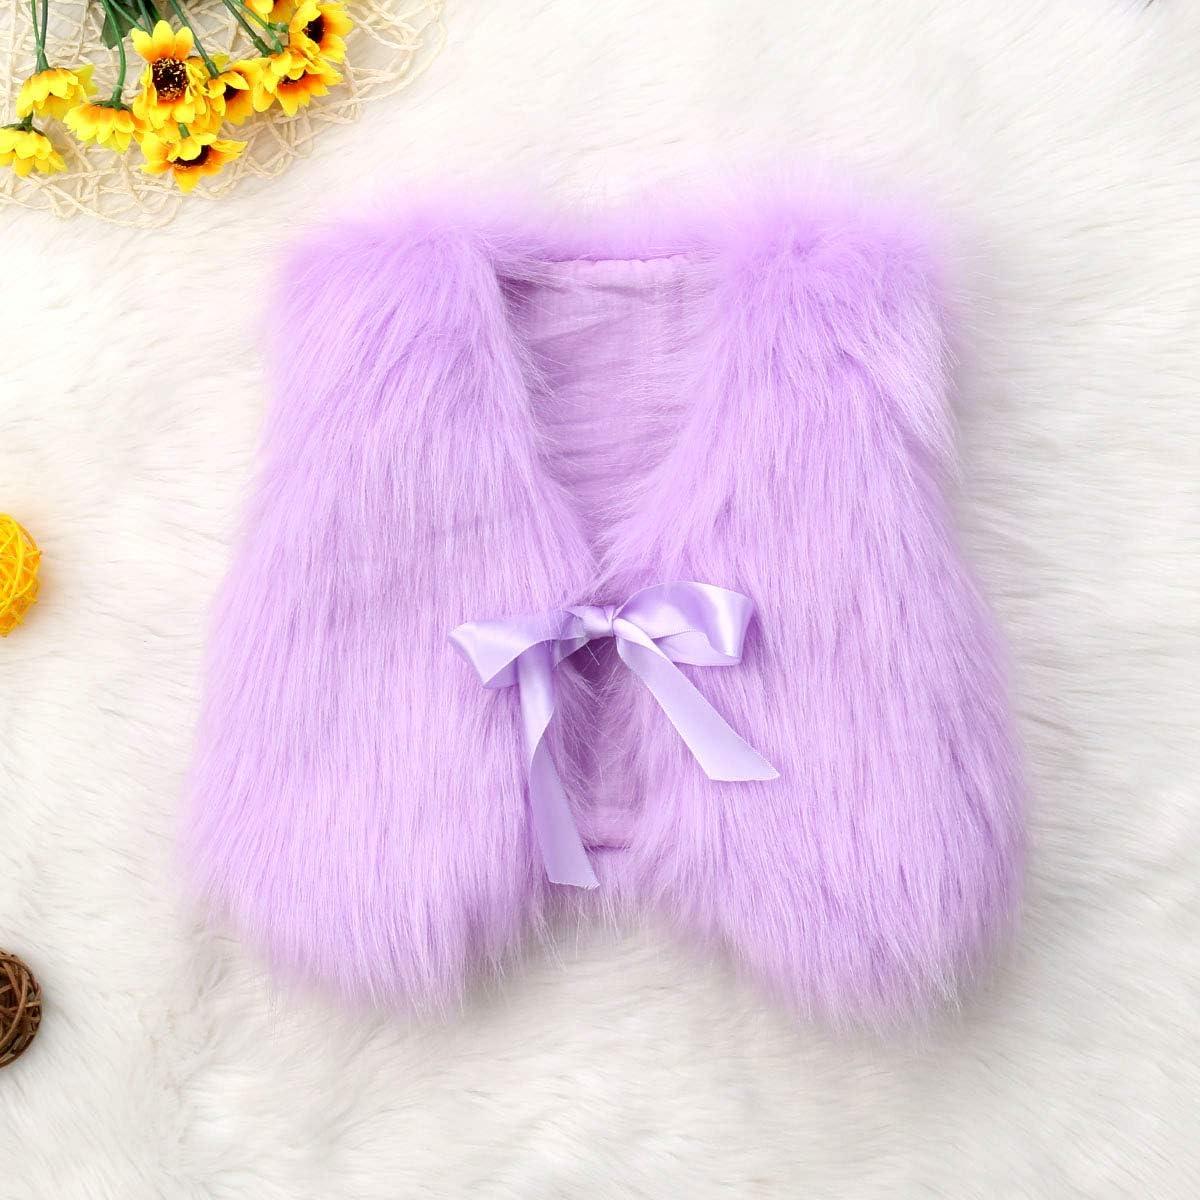 remeo suit Infant Baby Girl Soft Faux Fur Vest Coat Jacket Outwear Toddler Baby Warm Winter Waistcoat